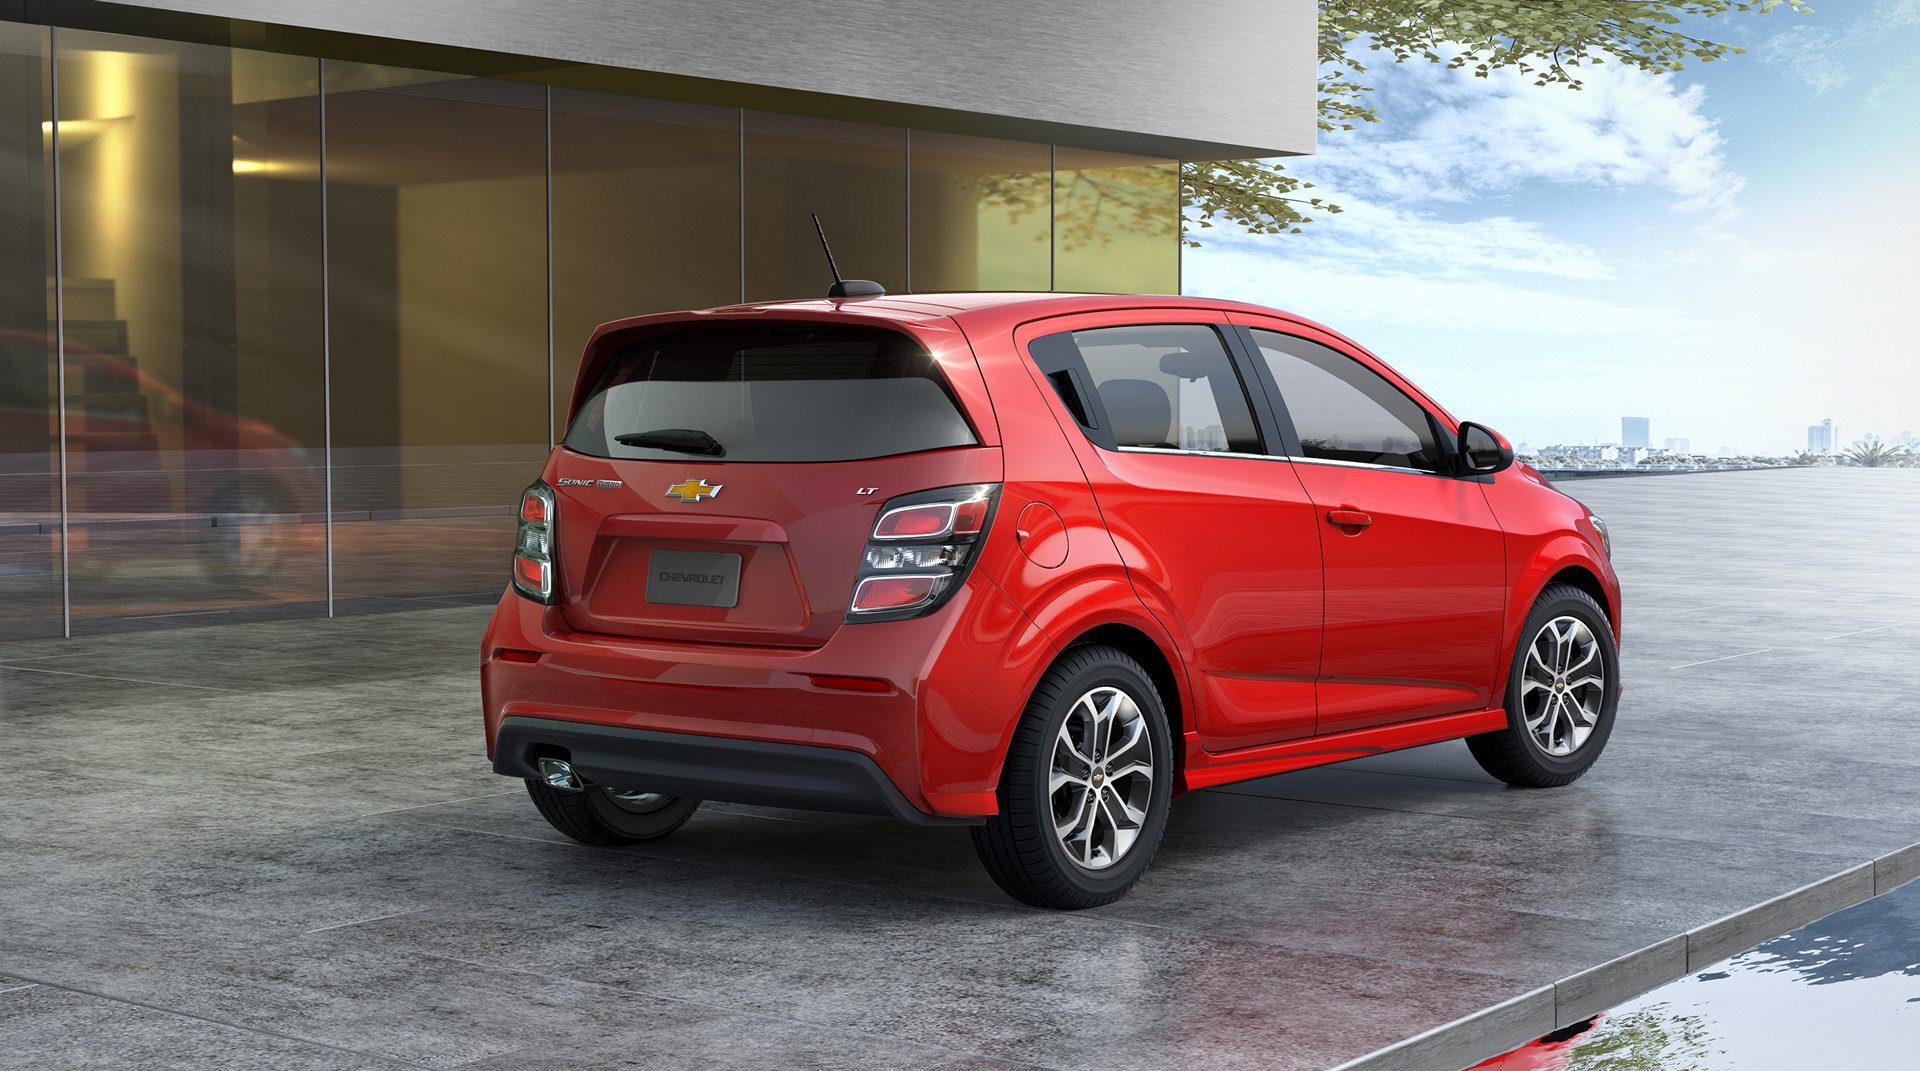 2017 Chevrolet Sonic © General Motors